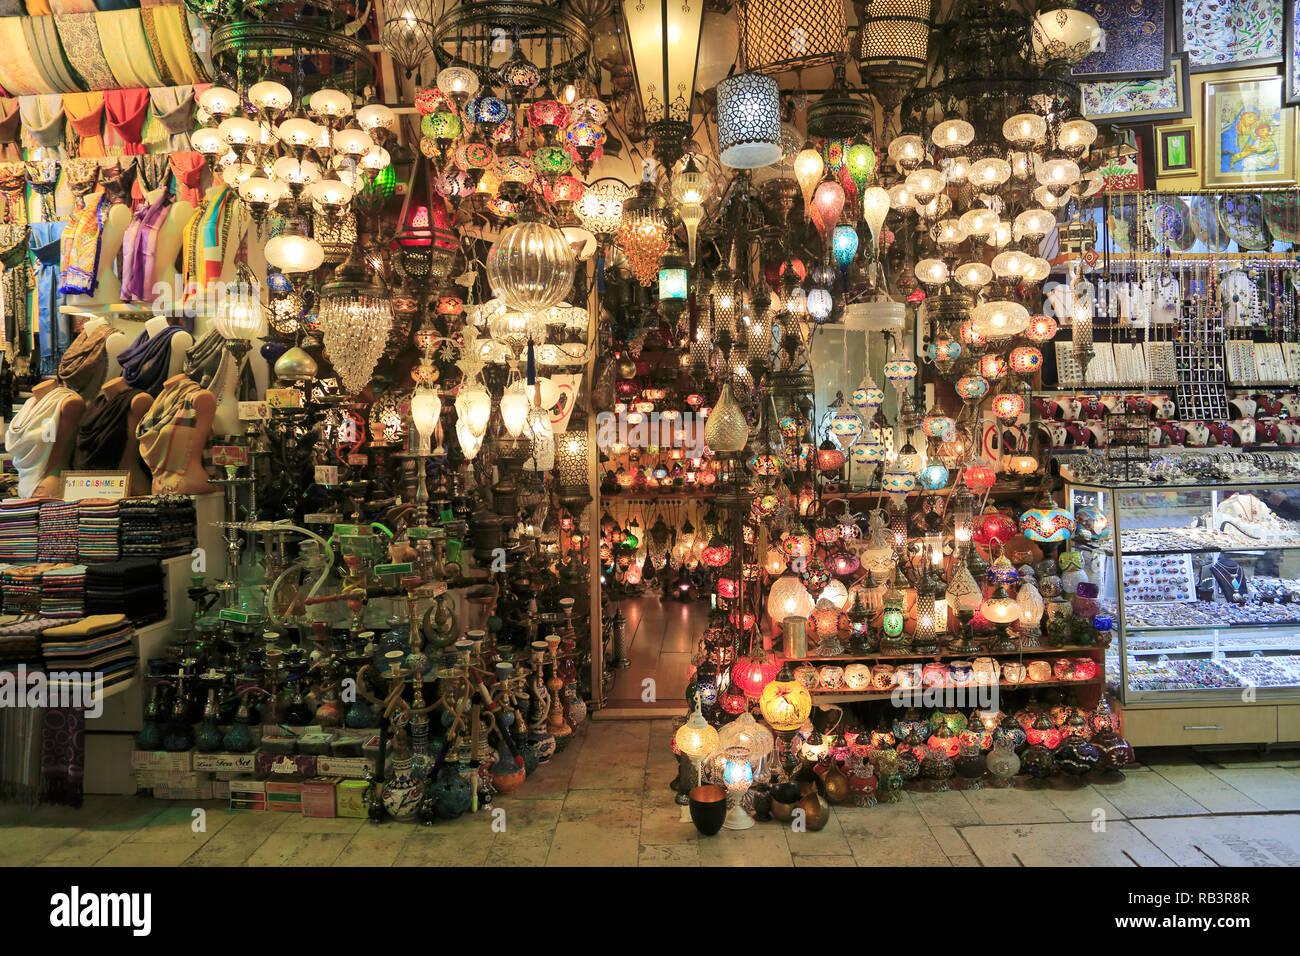 a798480ddc24 Grand Bazar, Kapali Carsi, Marché, Vieille Ville, Istanbul, Turquie, Europe